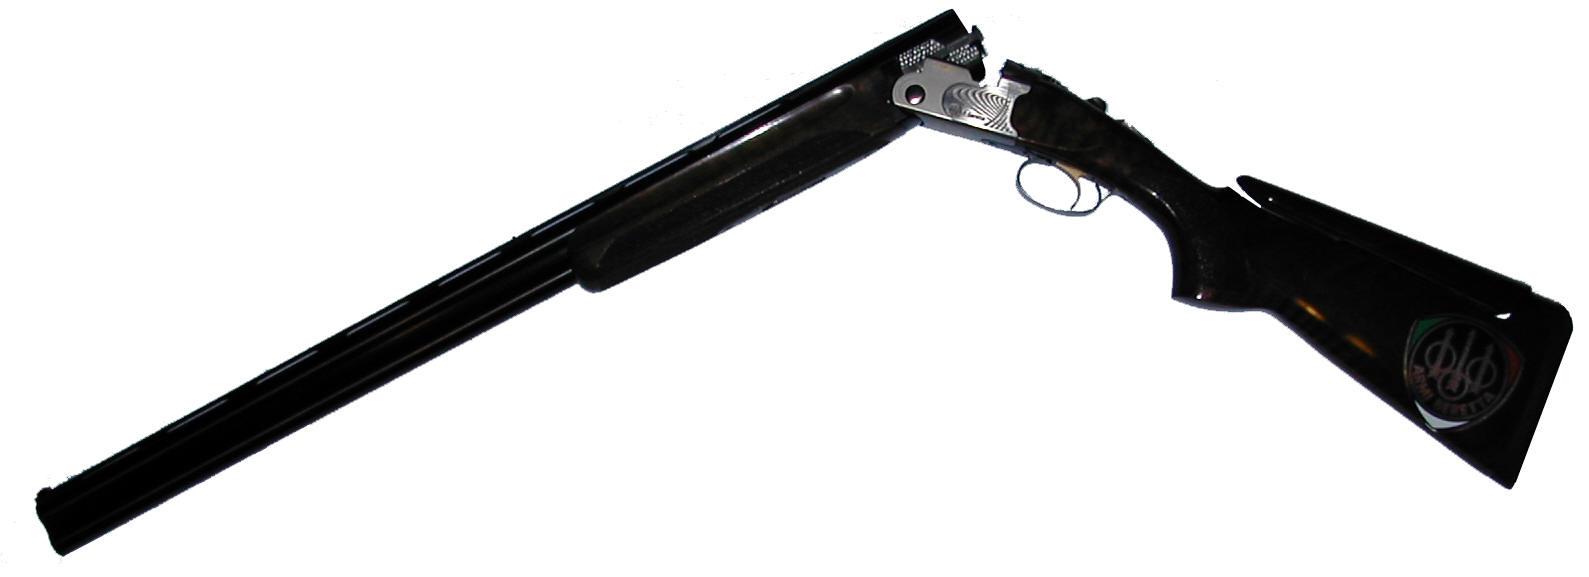 Dessin Fusil De Chasse choisir son fusil de ball